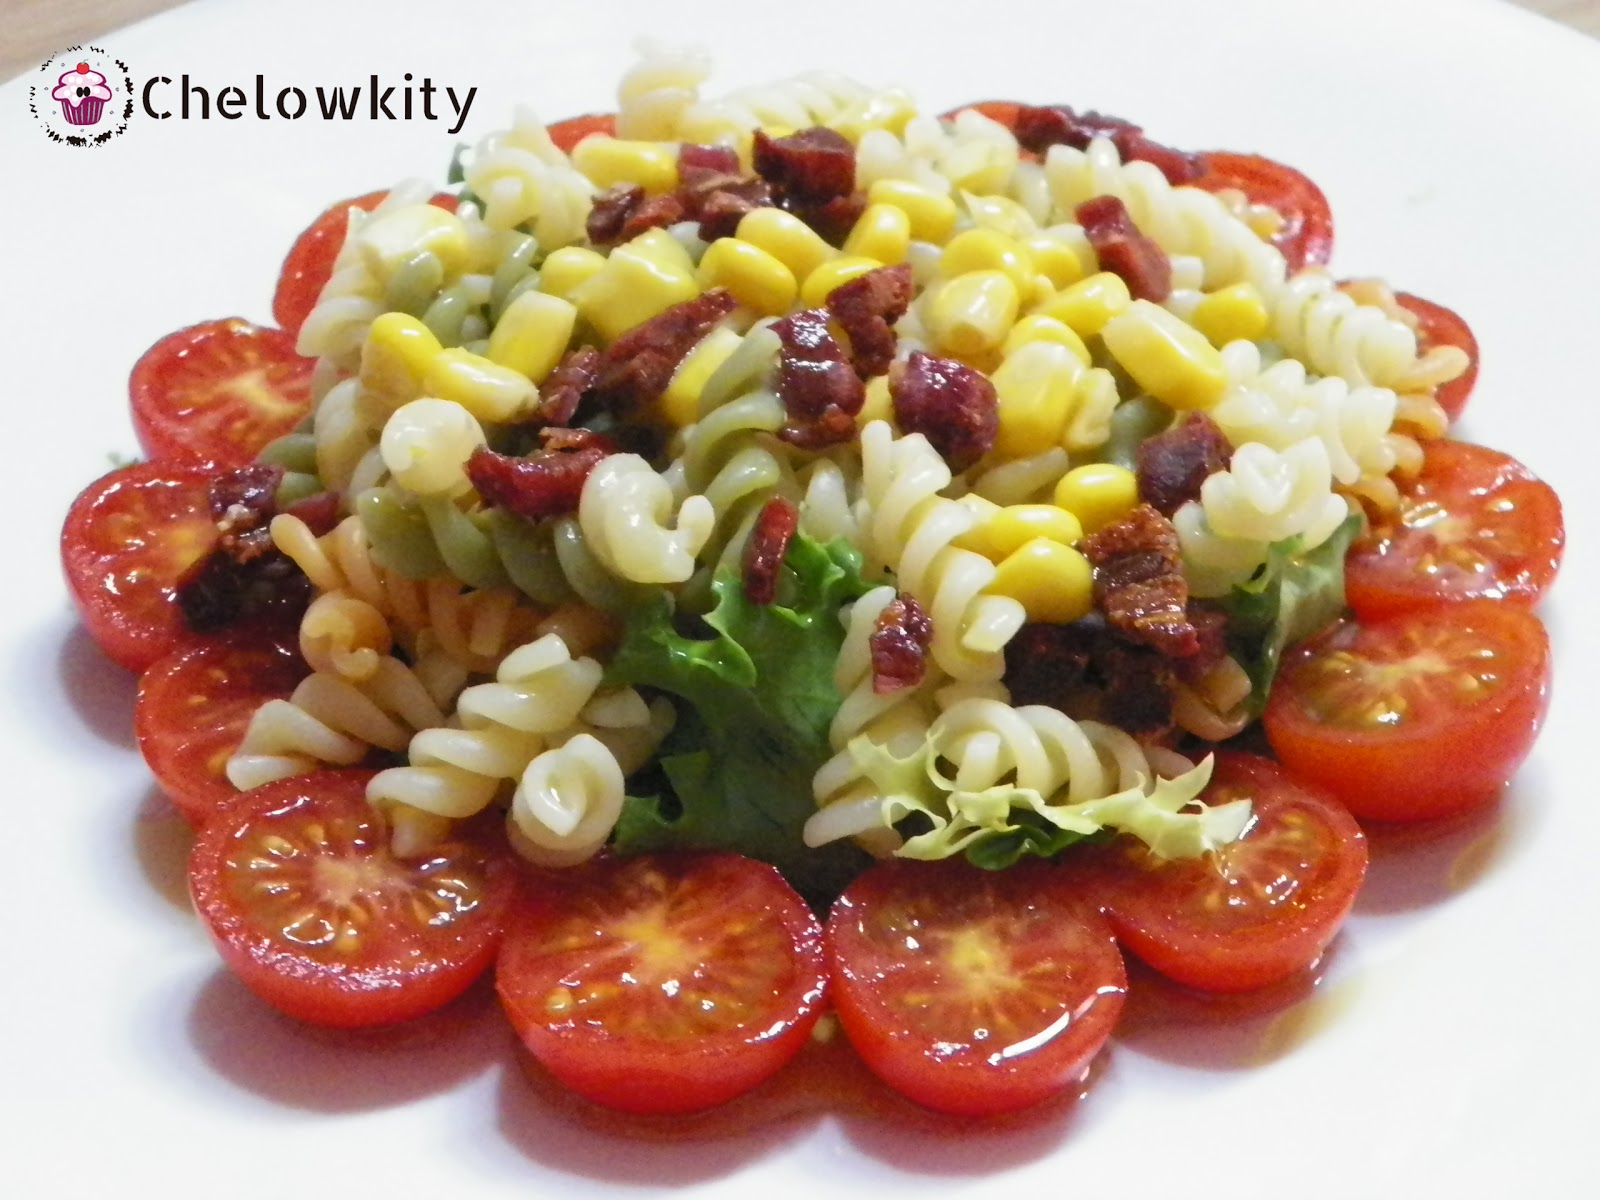 Chelowkity ensalada de espirales con crujiente de jam n - Ensaladas gourmet faciles ...